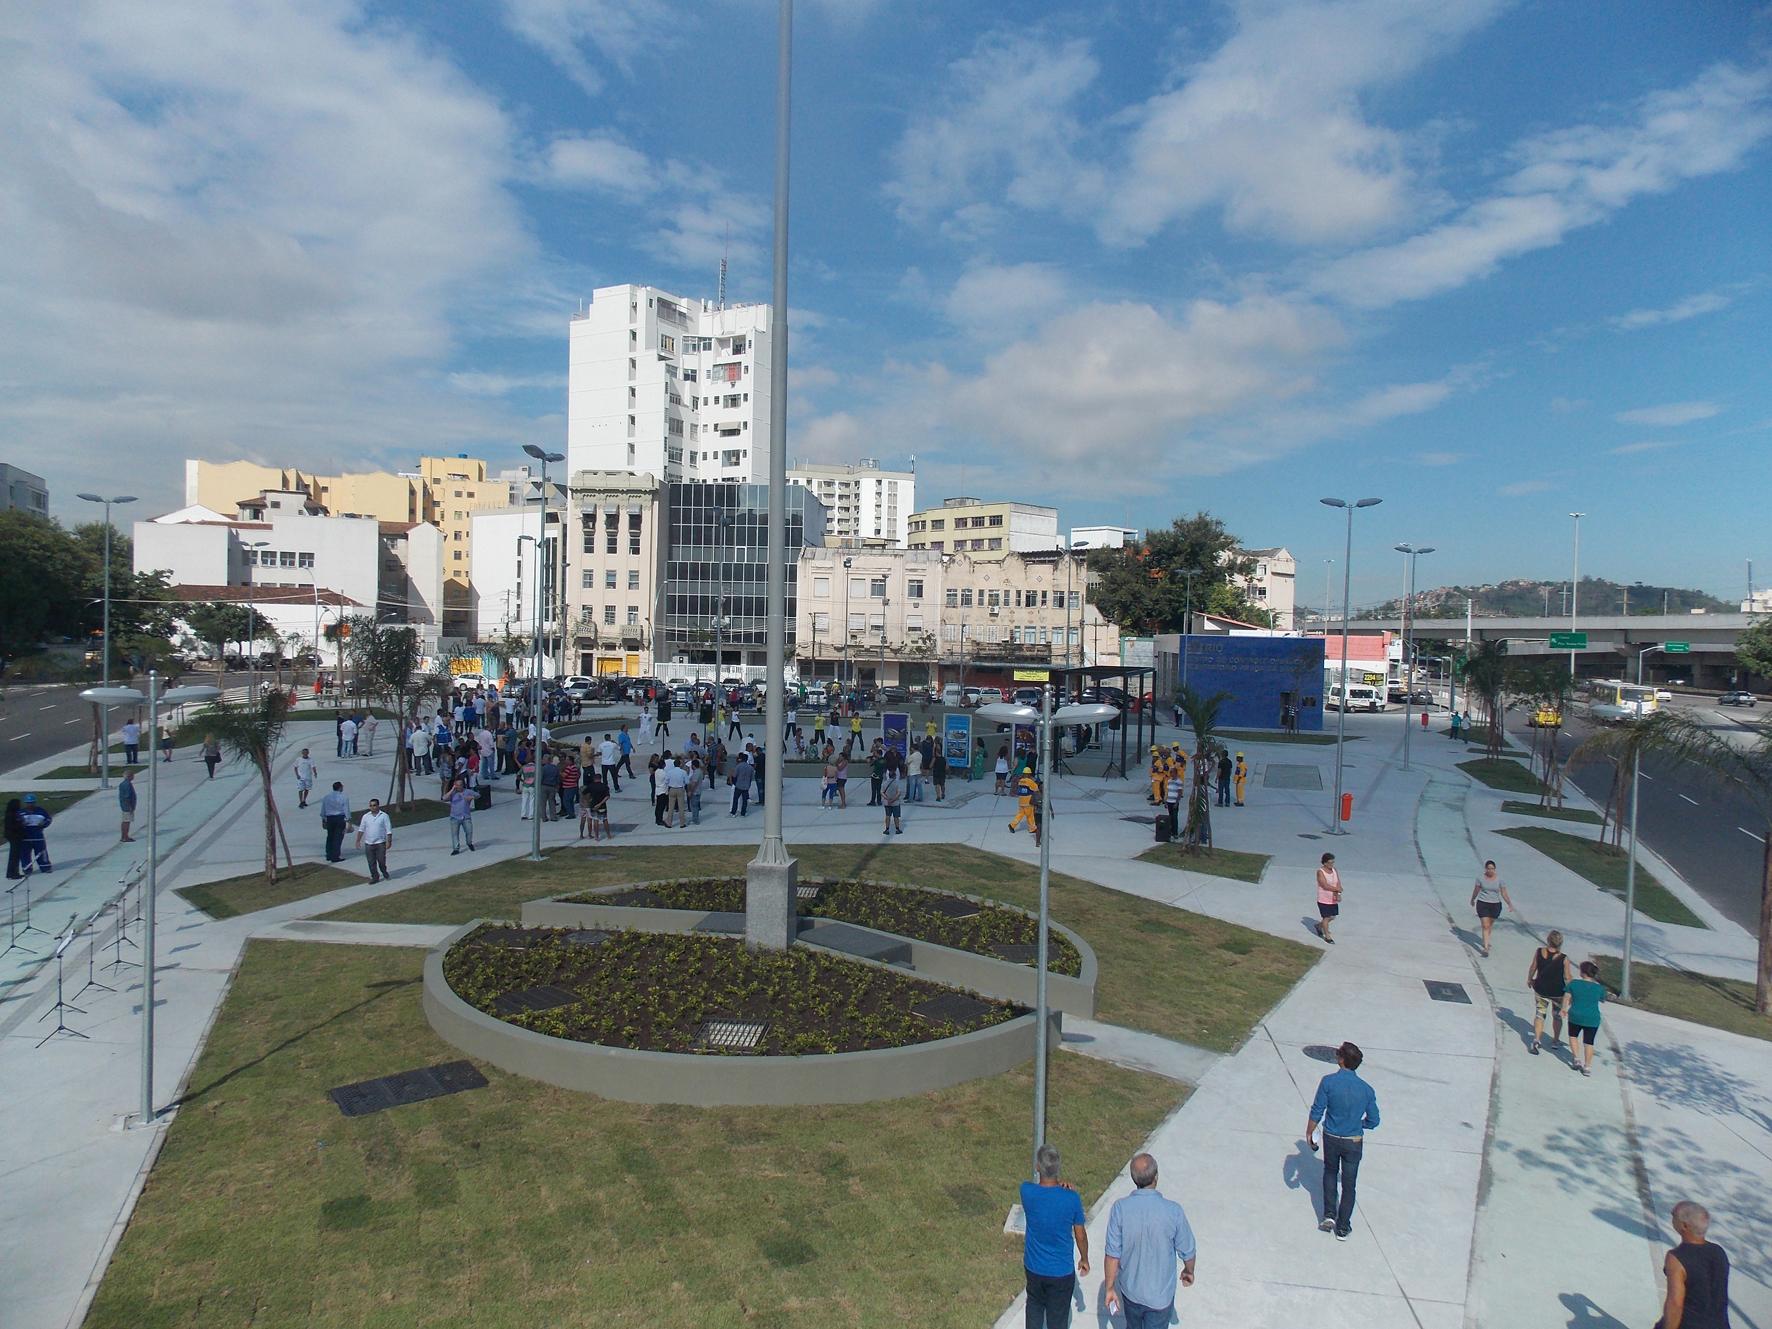 Prefeito inaugura Praça da Bandeira totalmente revitalizada